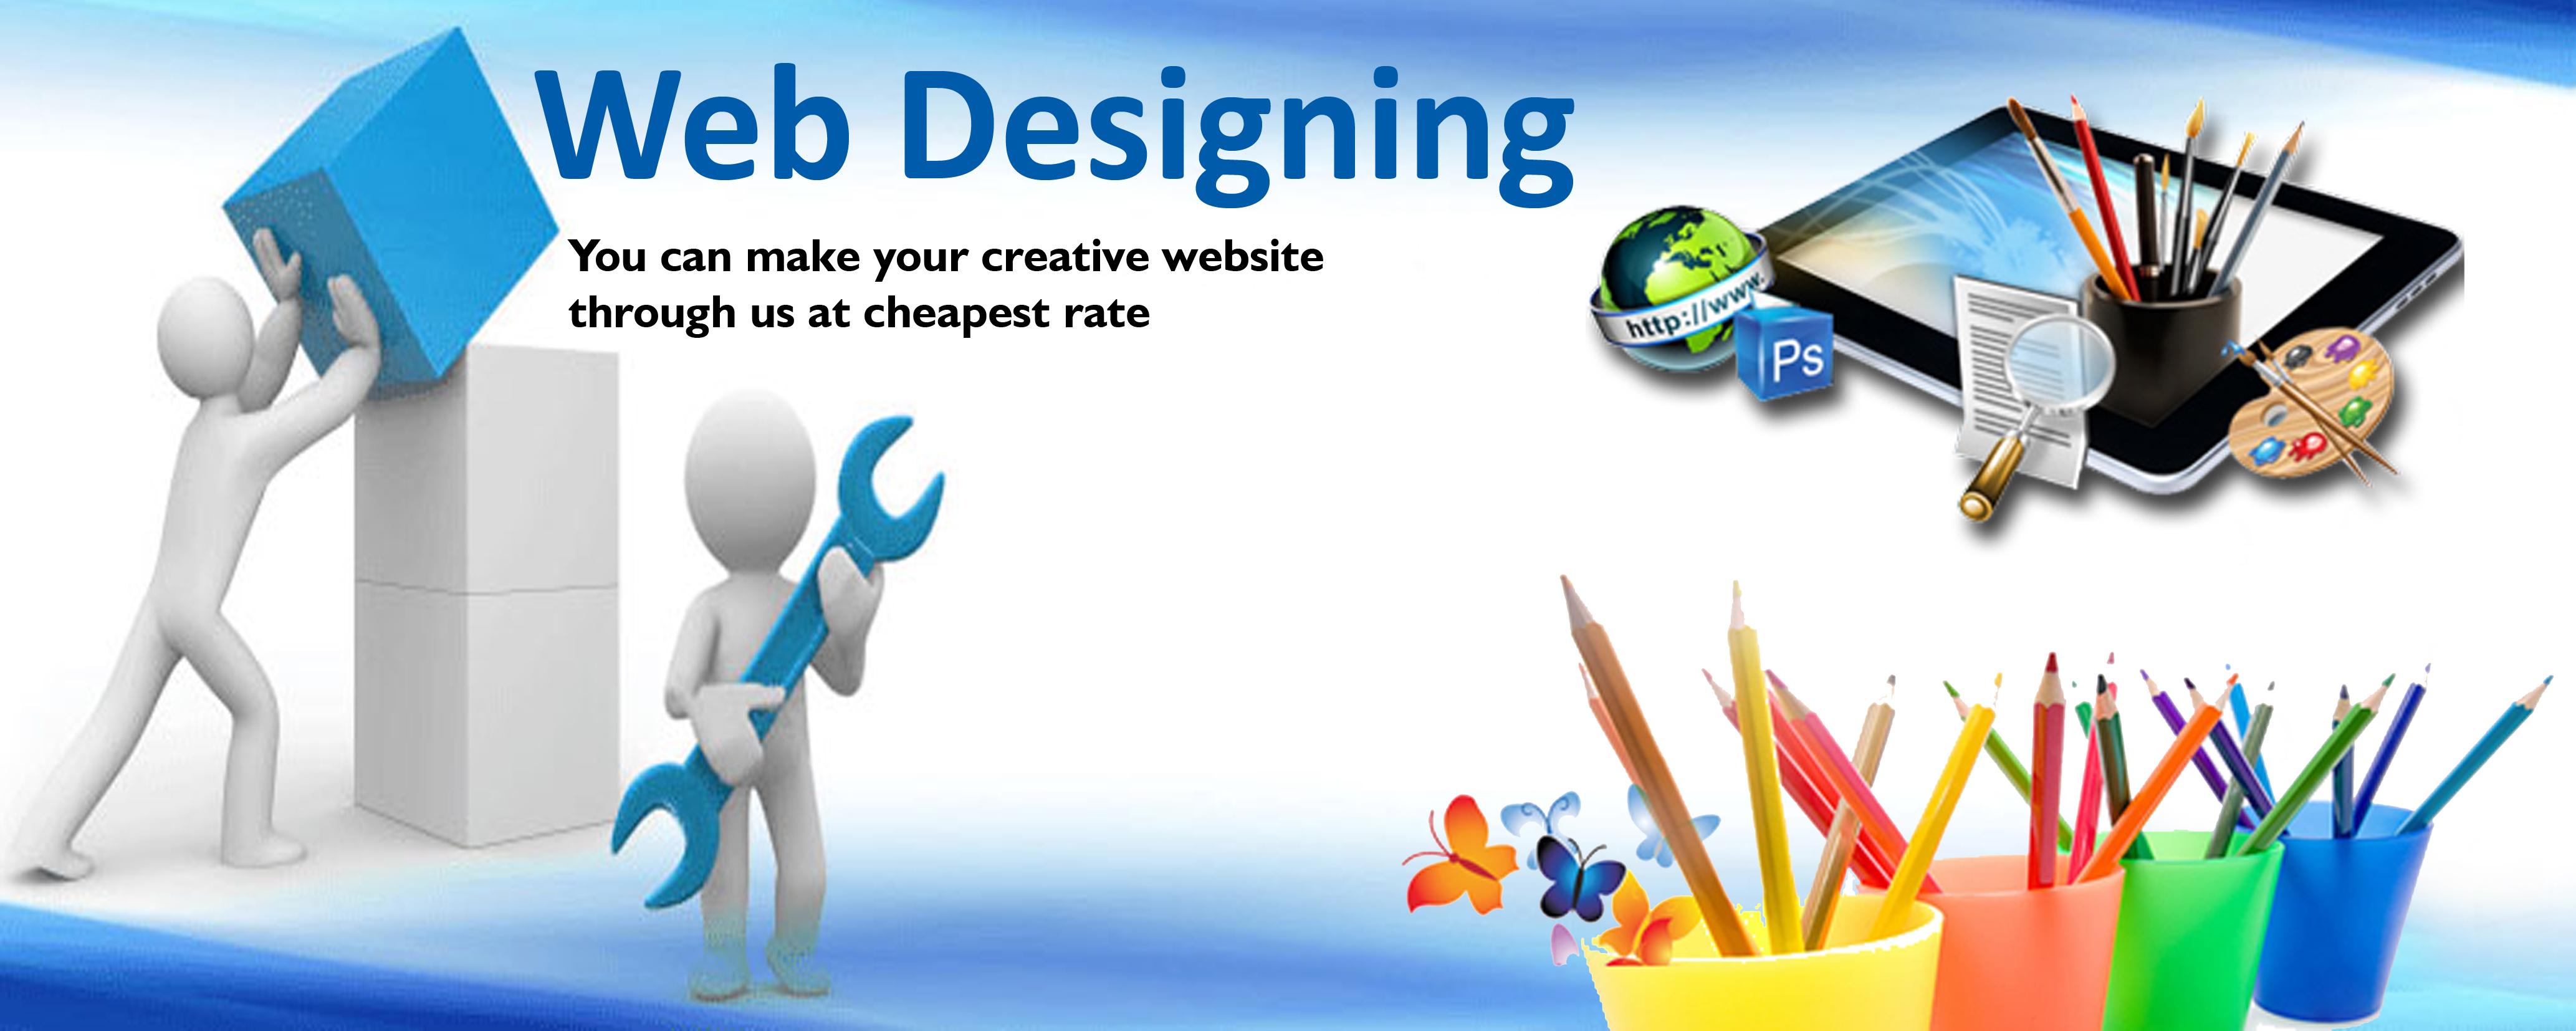 Web Design Company Kolkata Php Job Kolkata